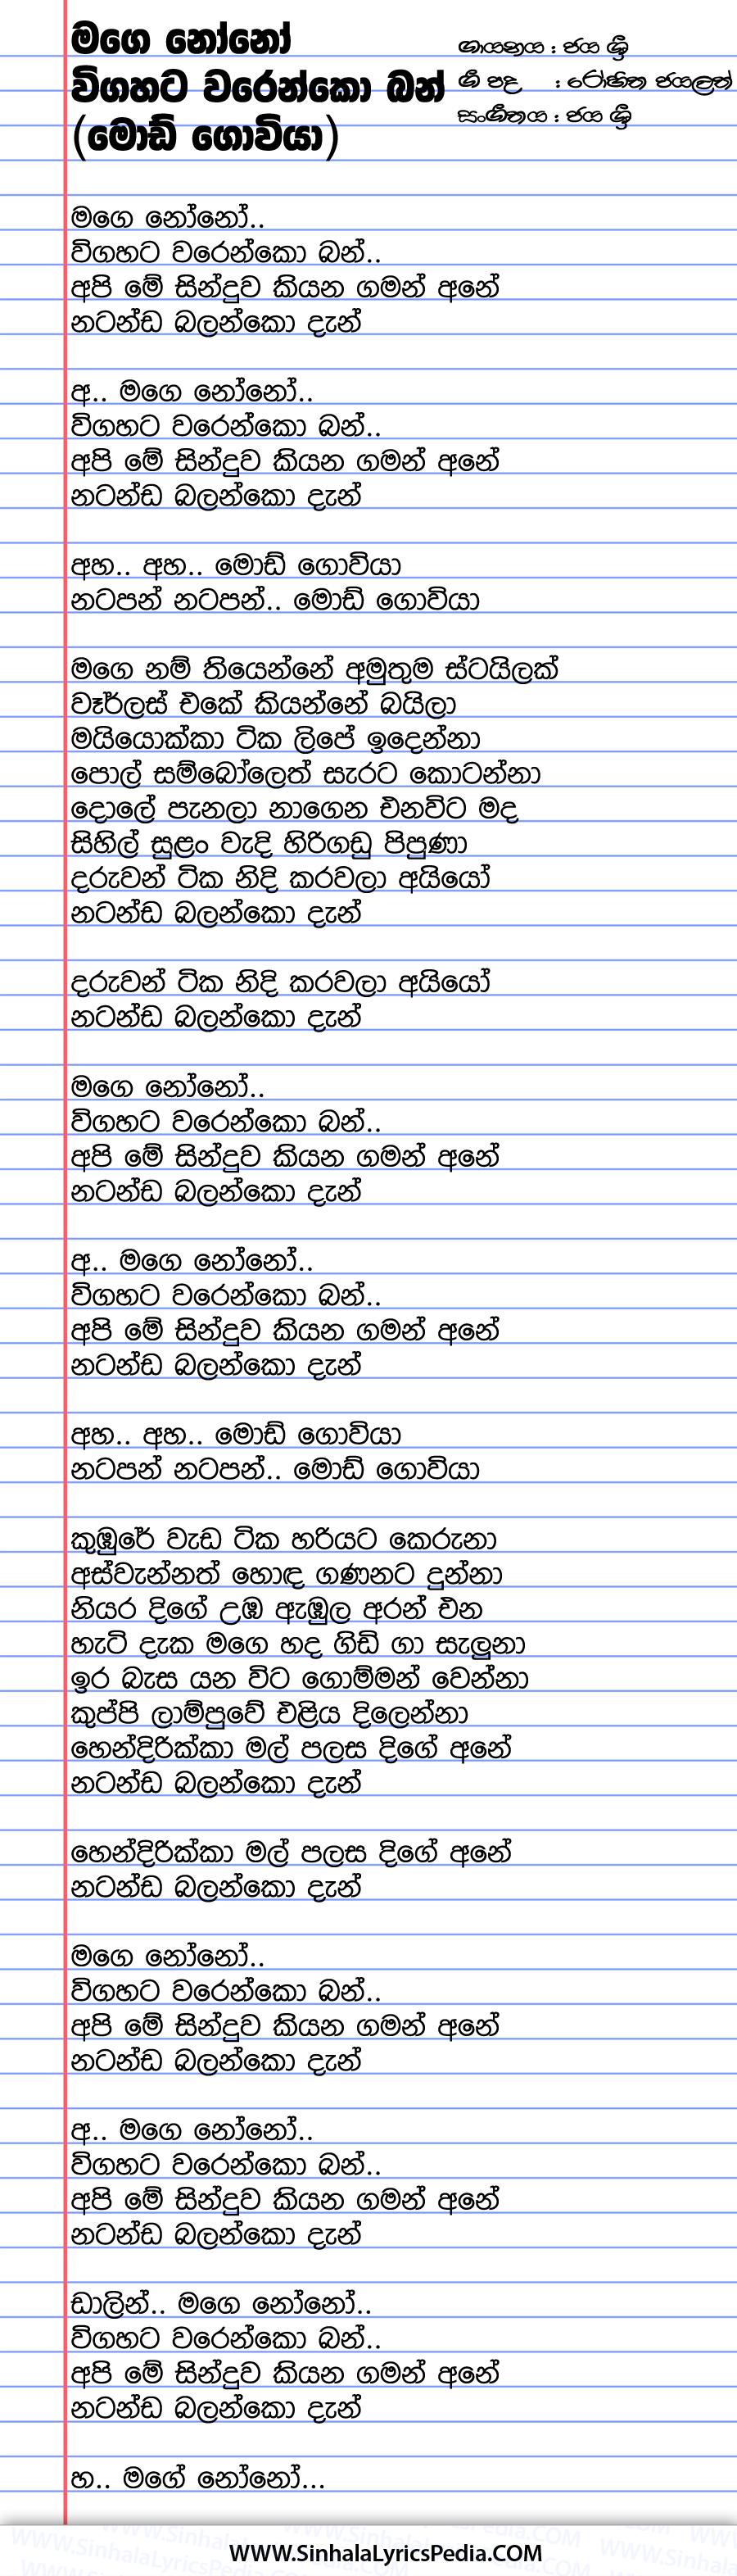 Mage Nono Wigahata (Mod Goviya) Song Lyrics